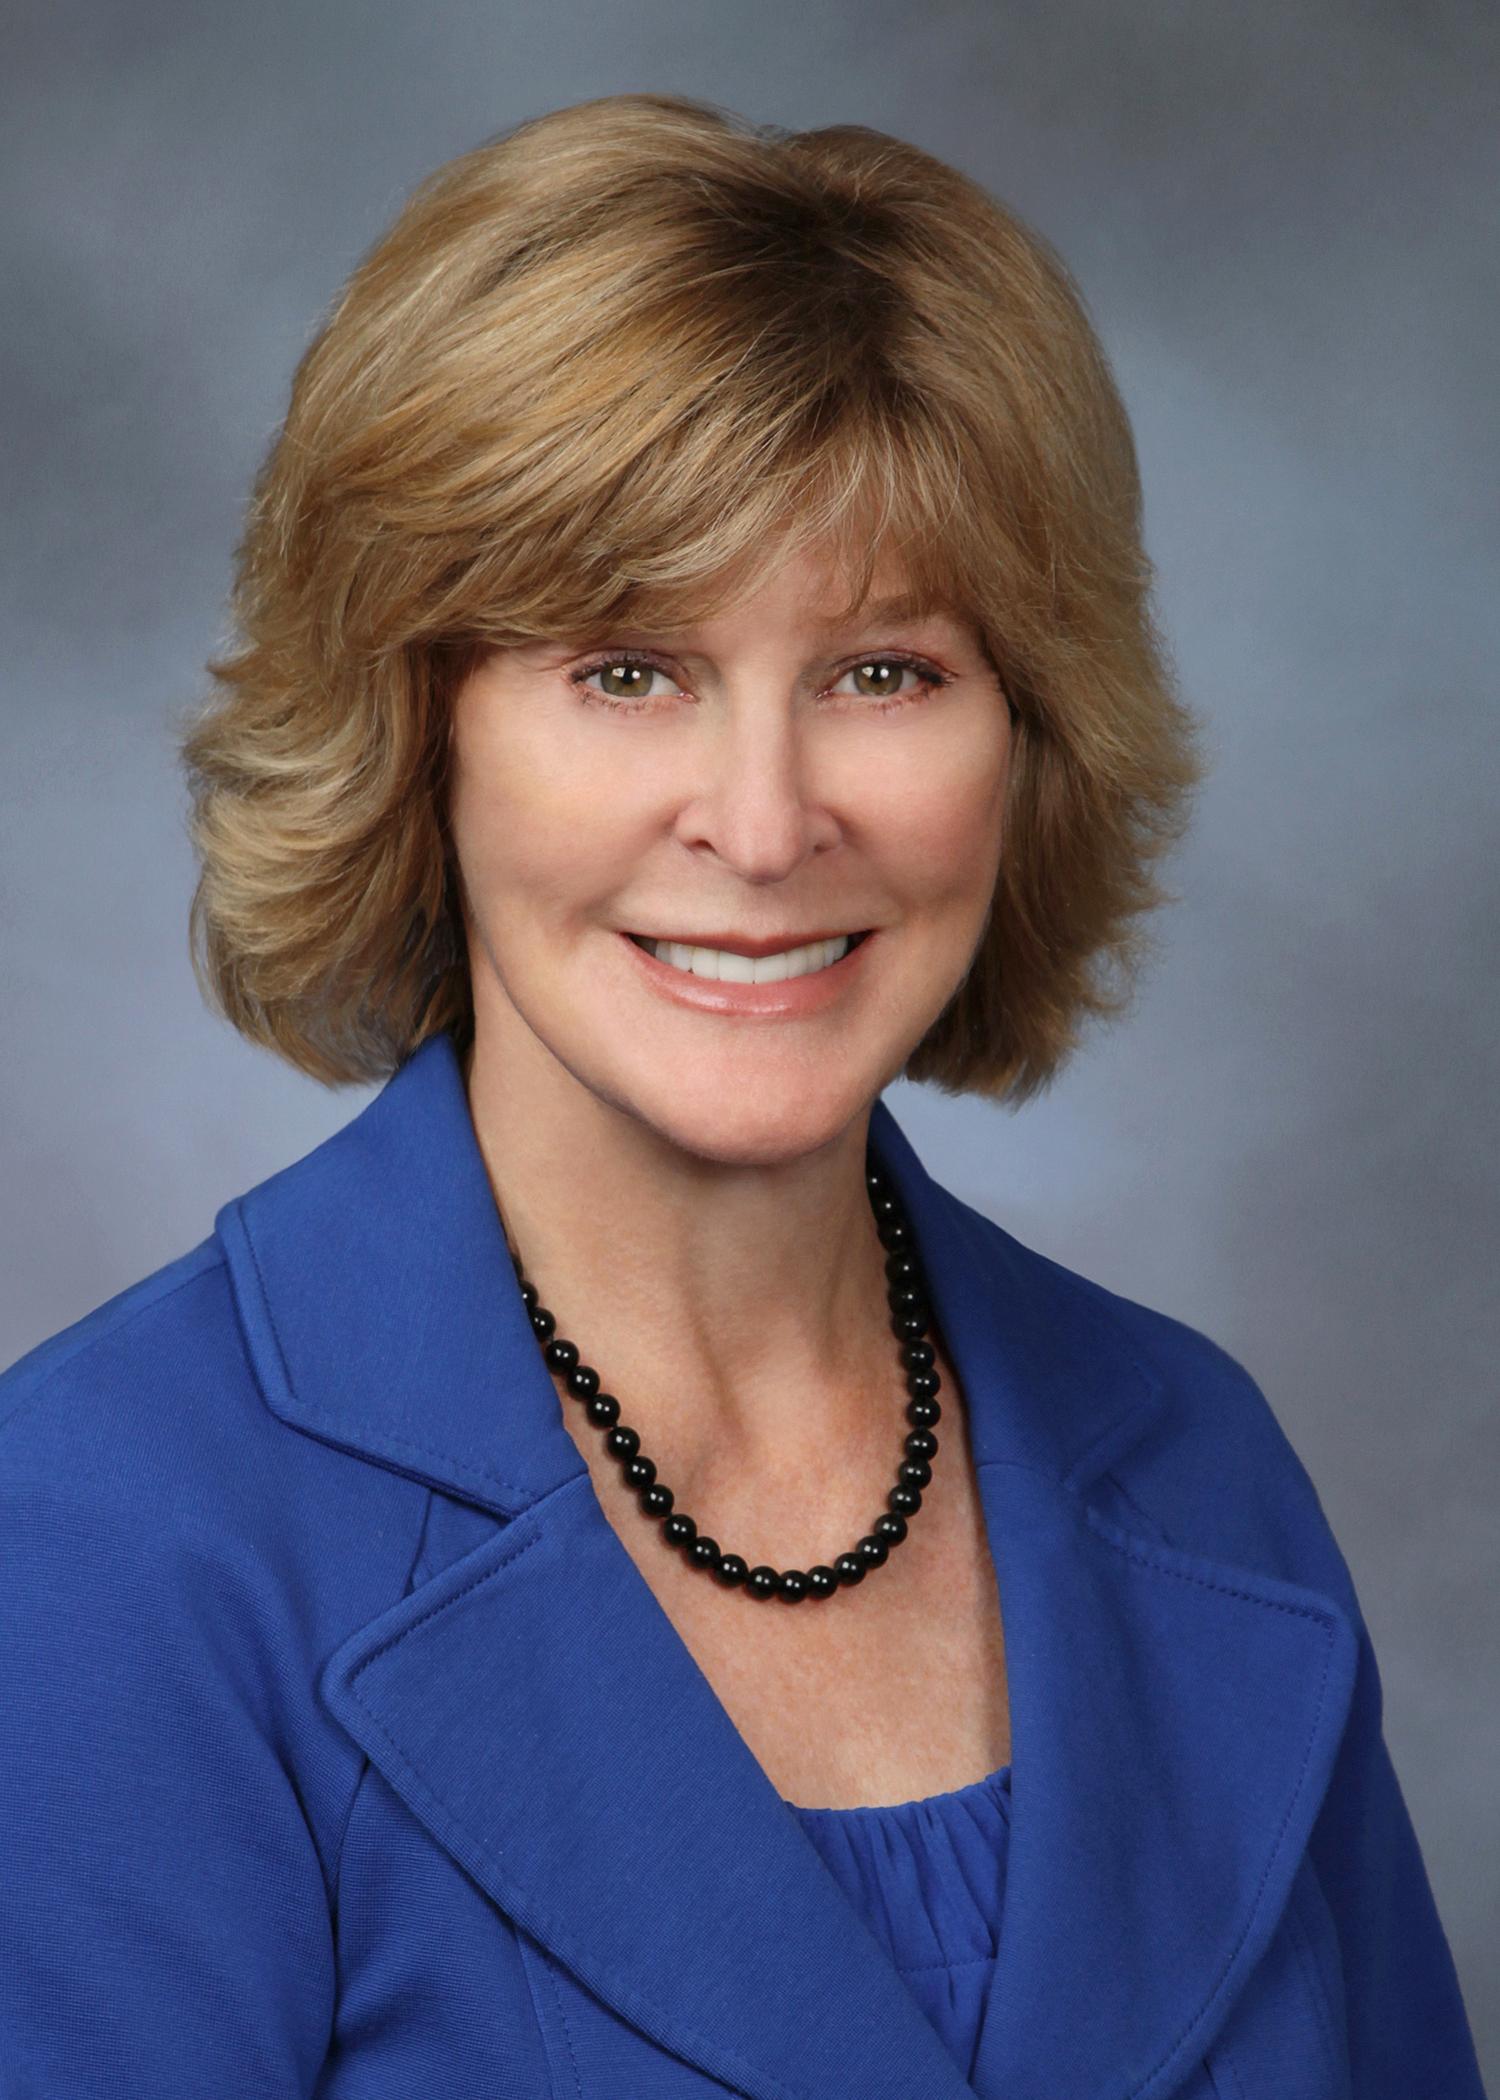 Jane C. Luxton